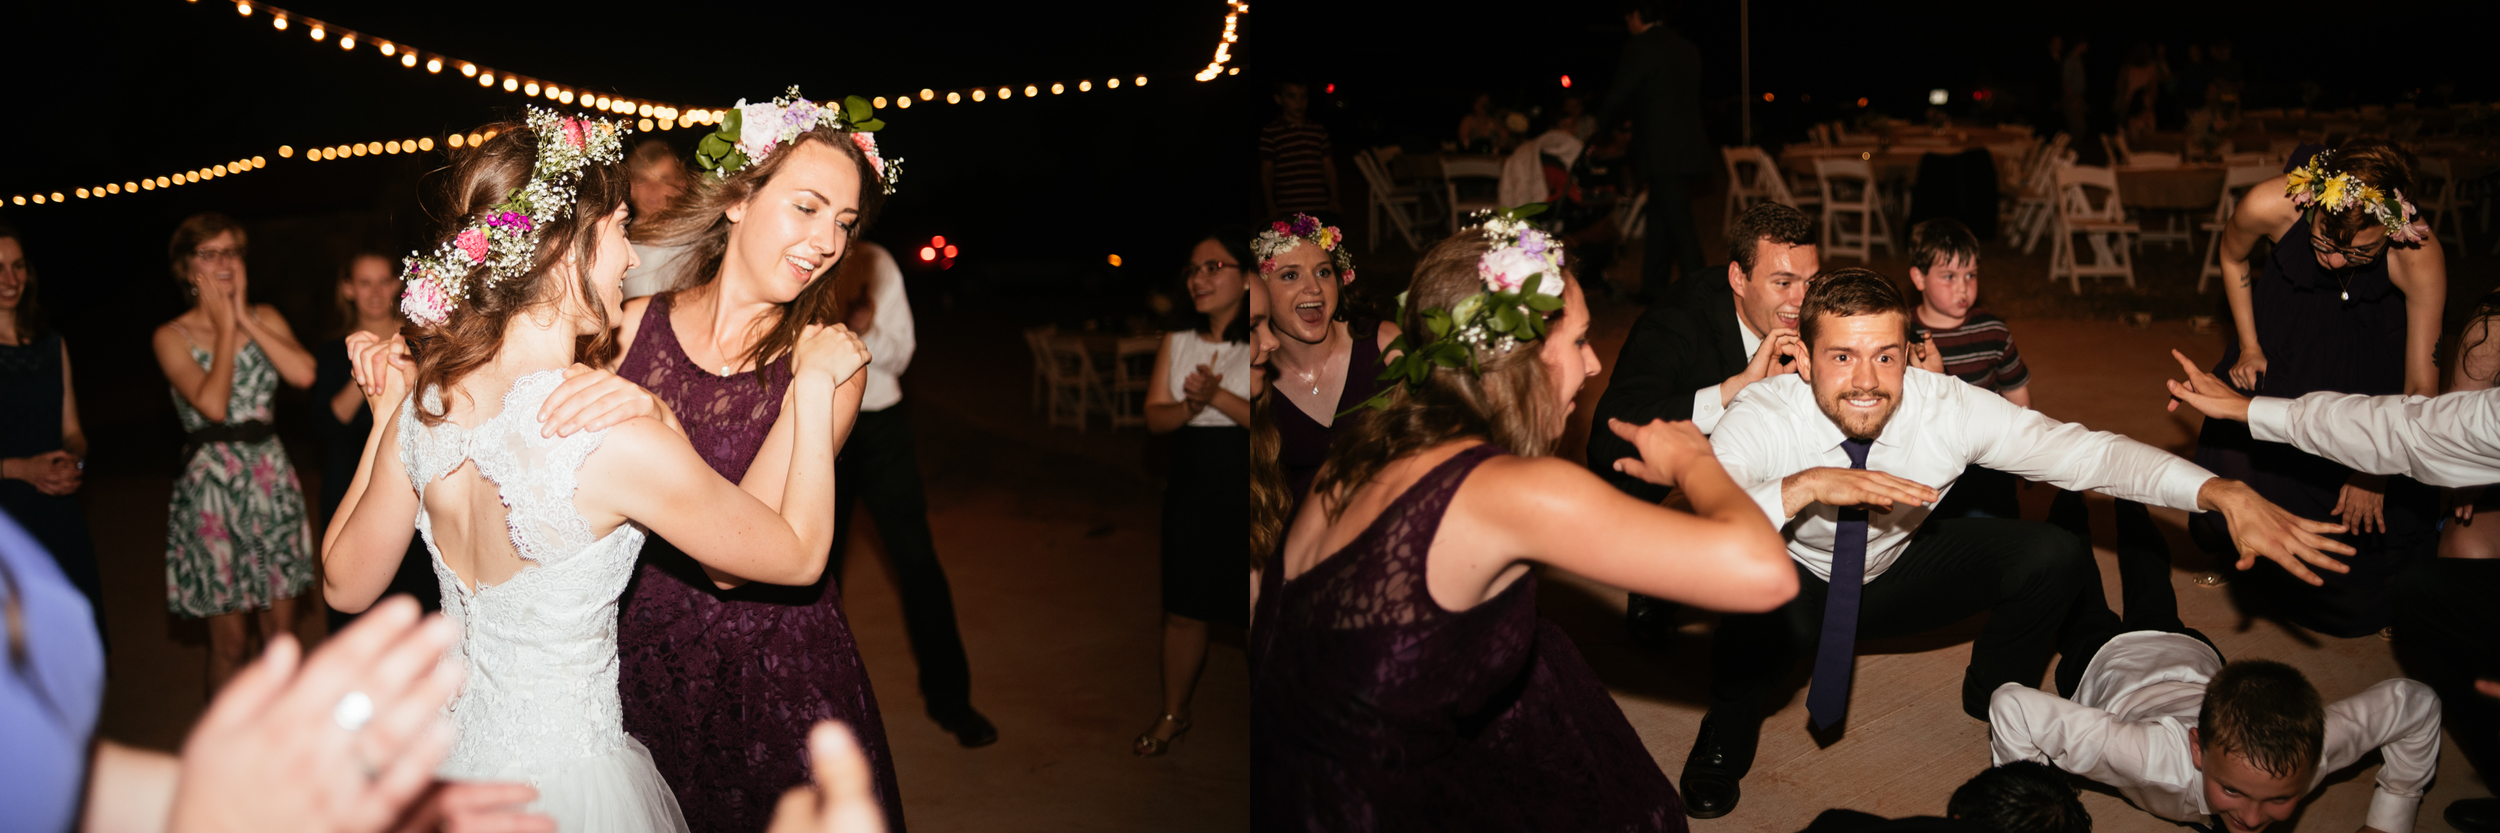 McCurrach Wedding18.jpg